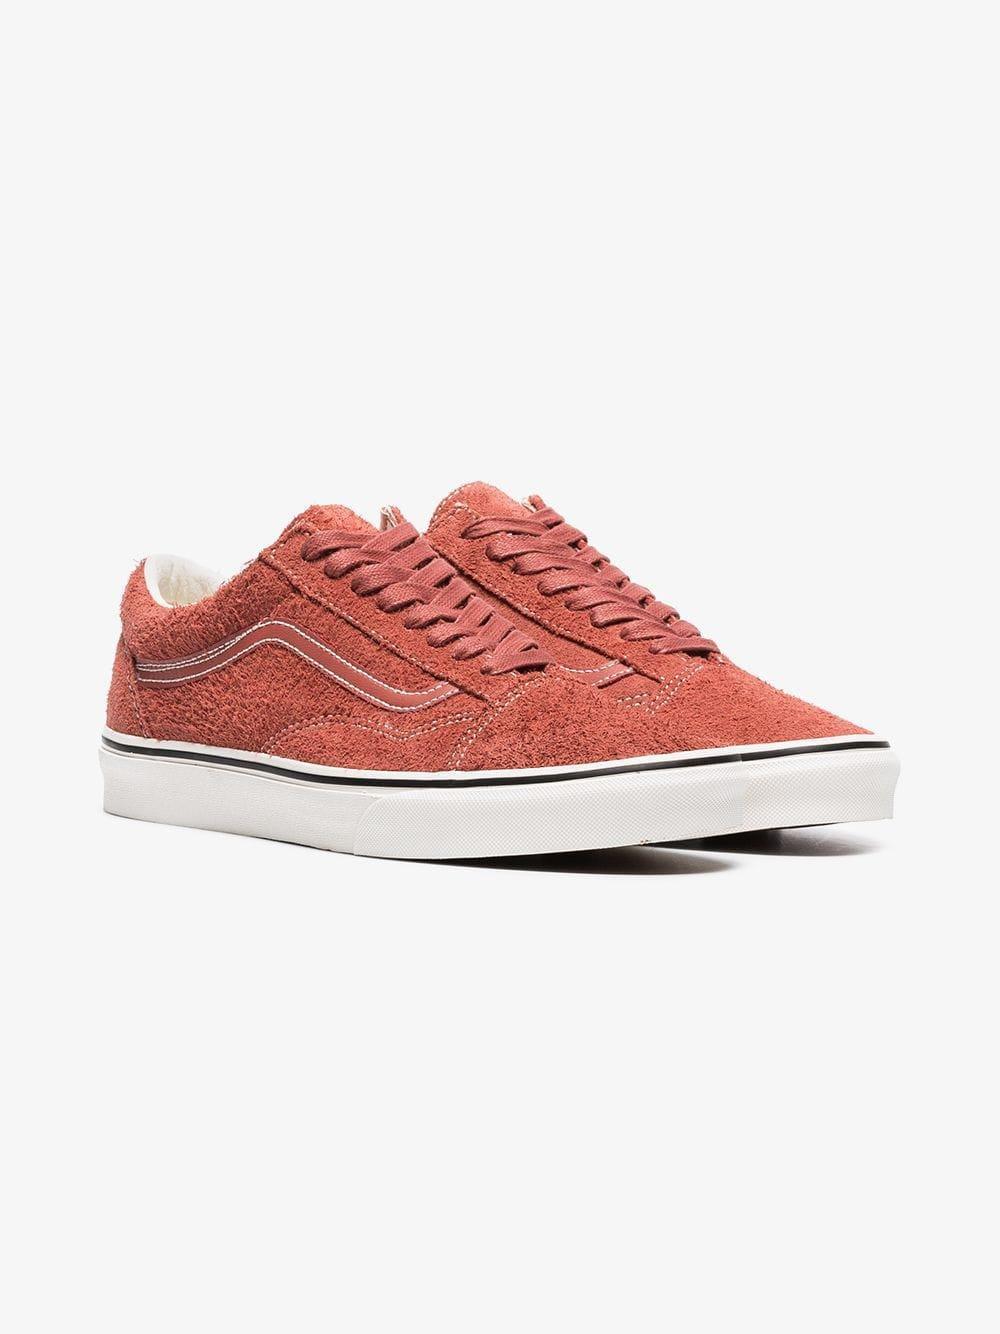 c19bc3dbf1 Lyst - Vans Red Hot Sauce Old Skool Suede Sneakers in Orange for Men ...